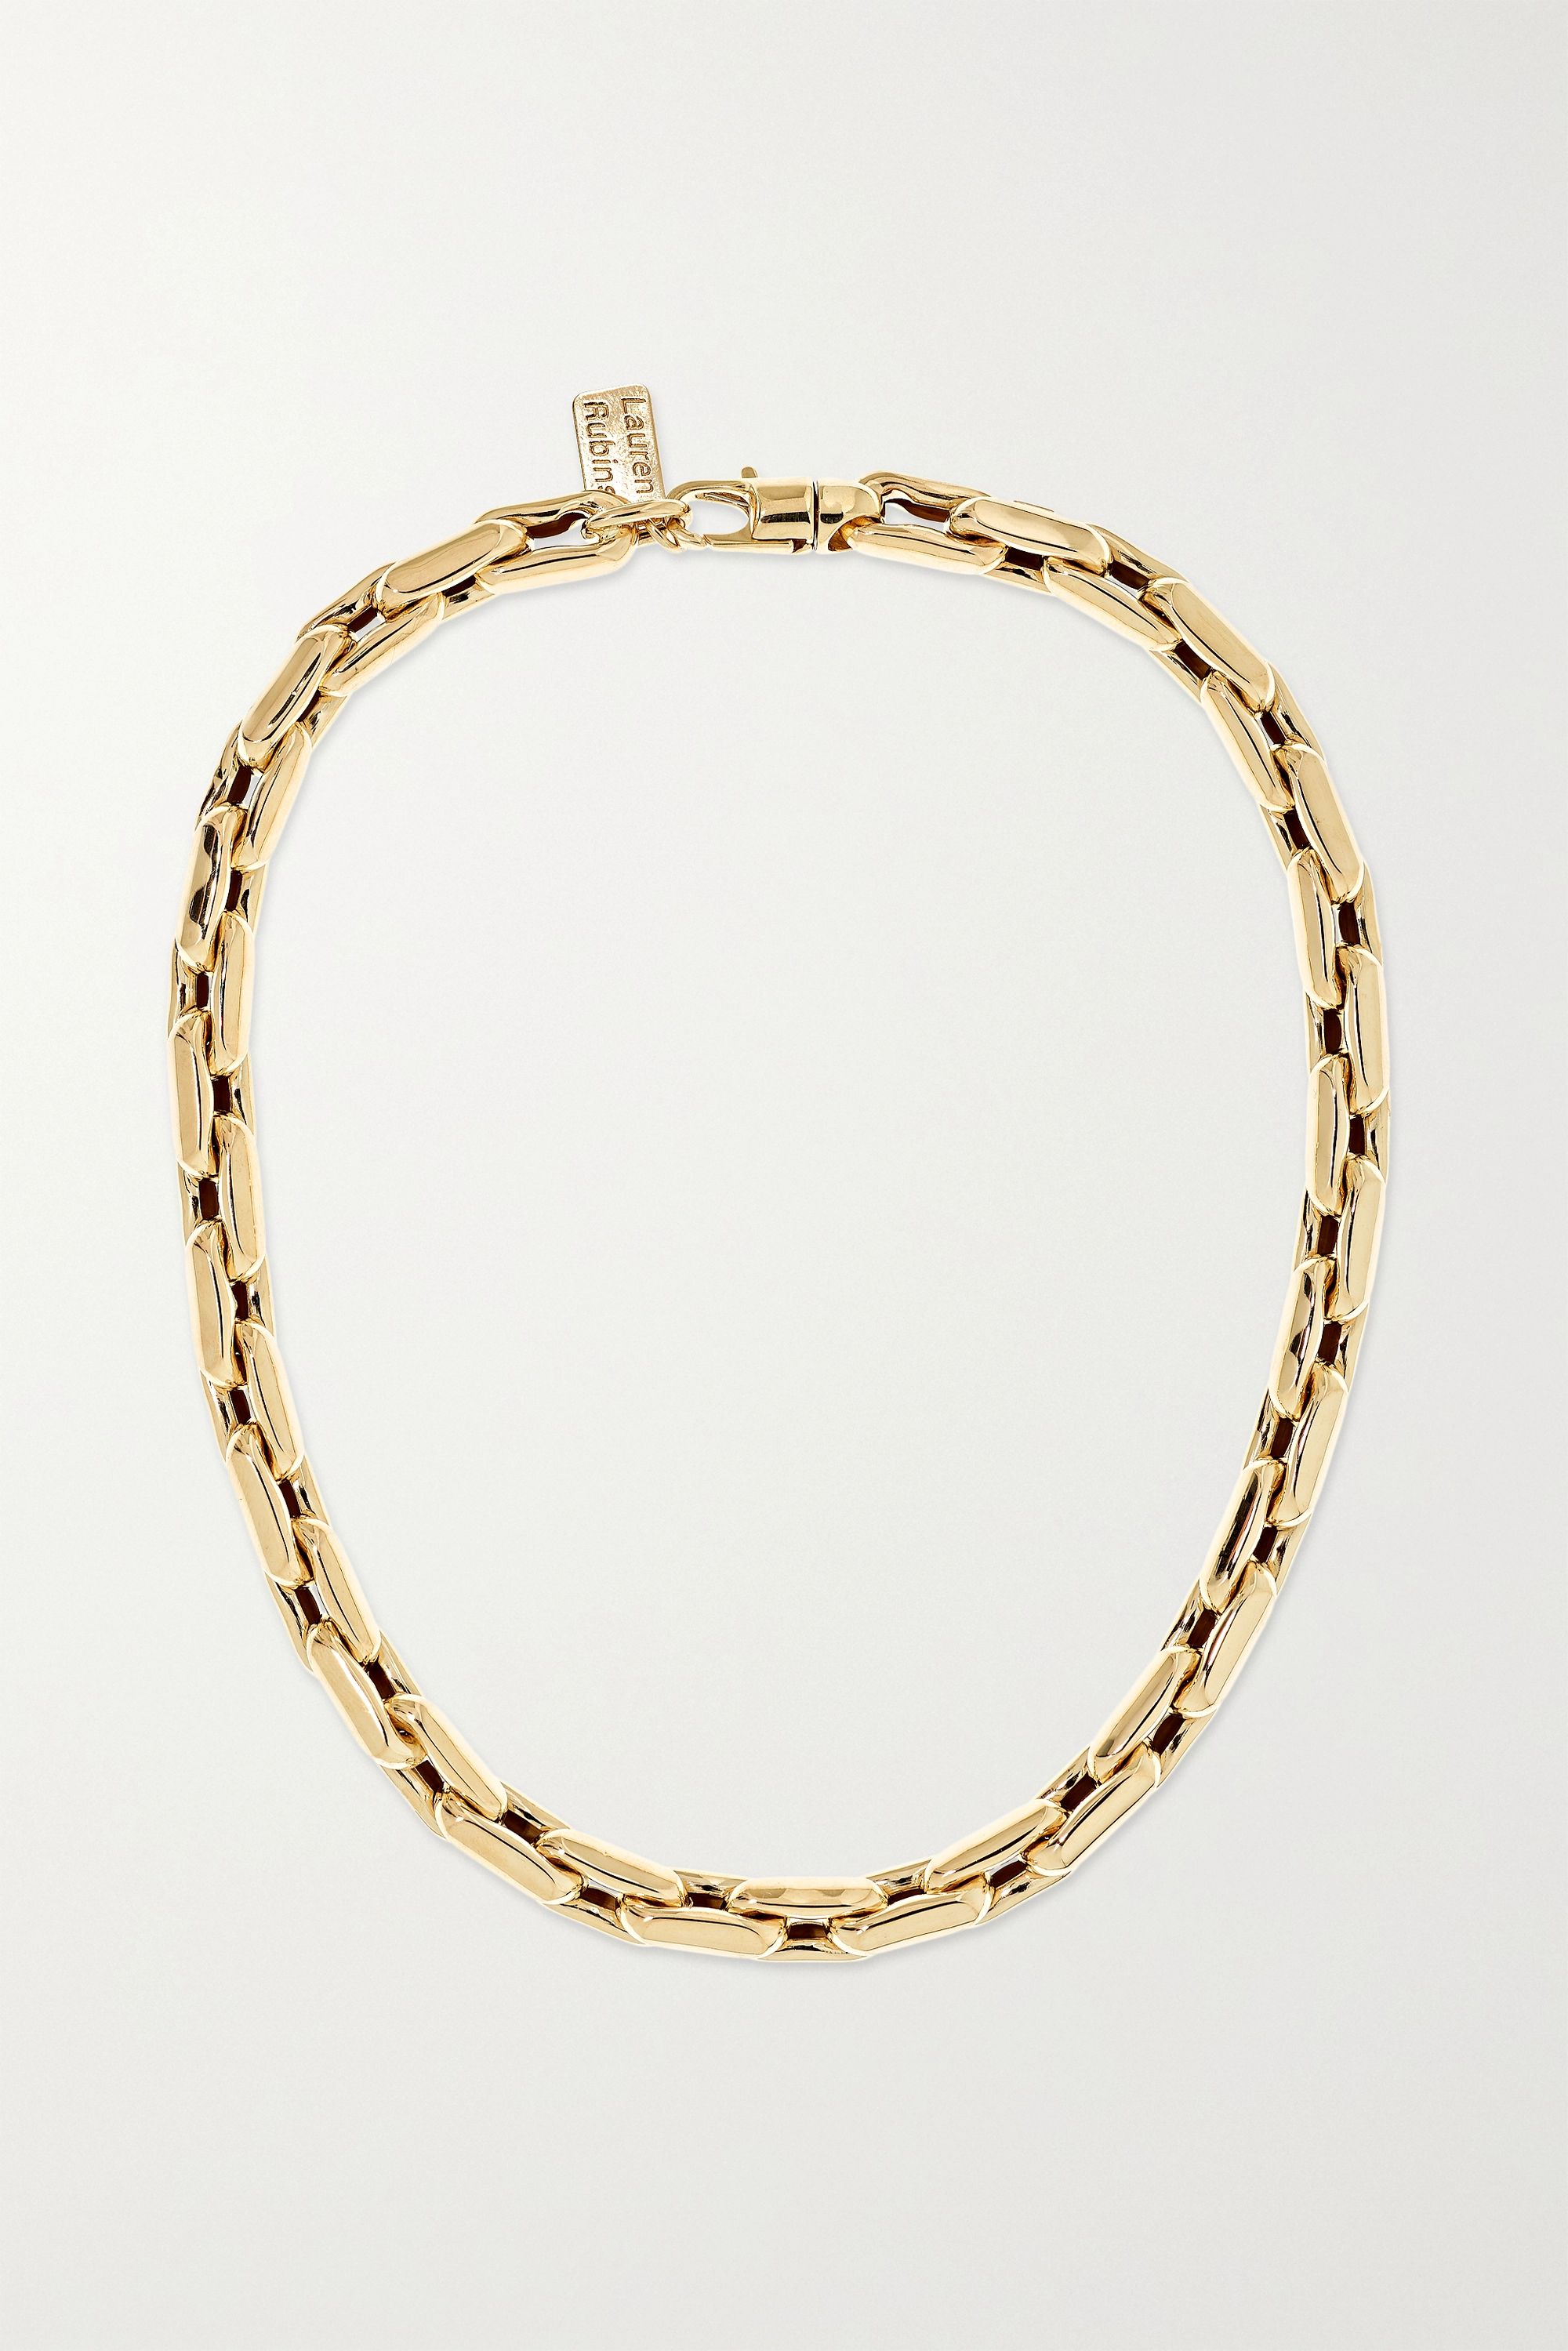 Lauren Rubinski Small Kette aus 14 Karat Gold